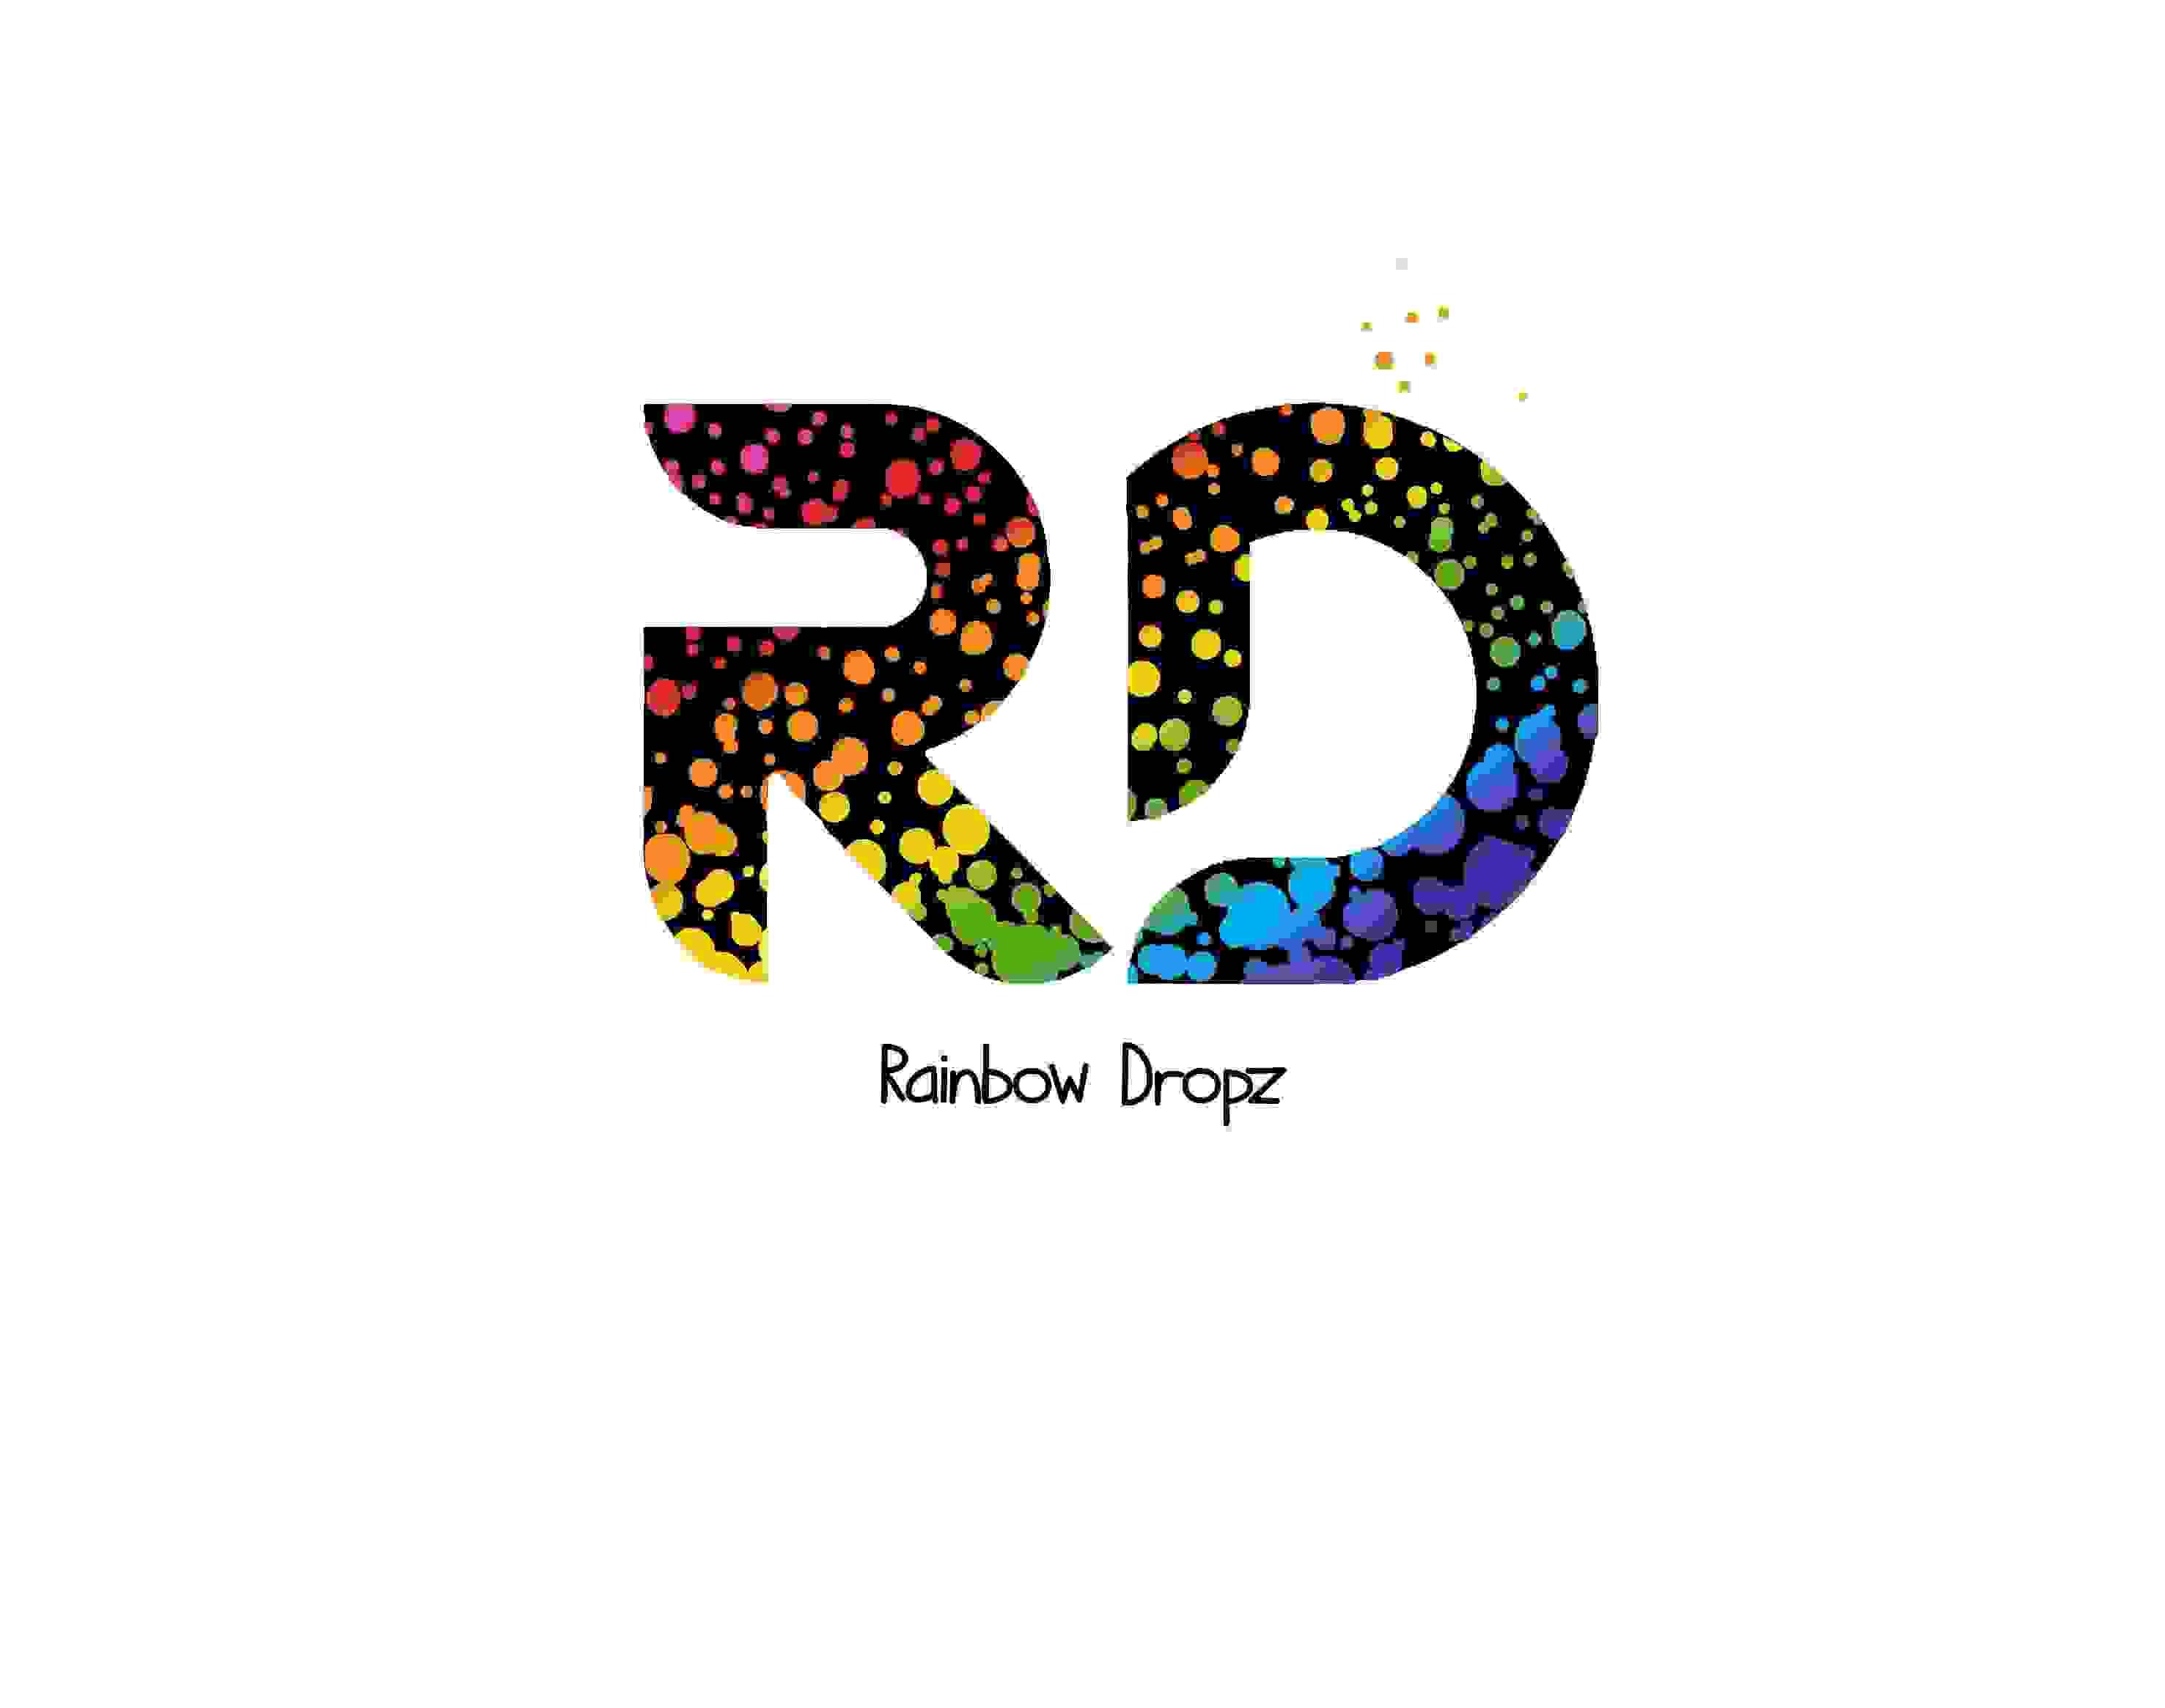 Rainbow Dropz